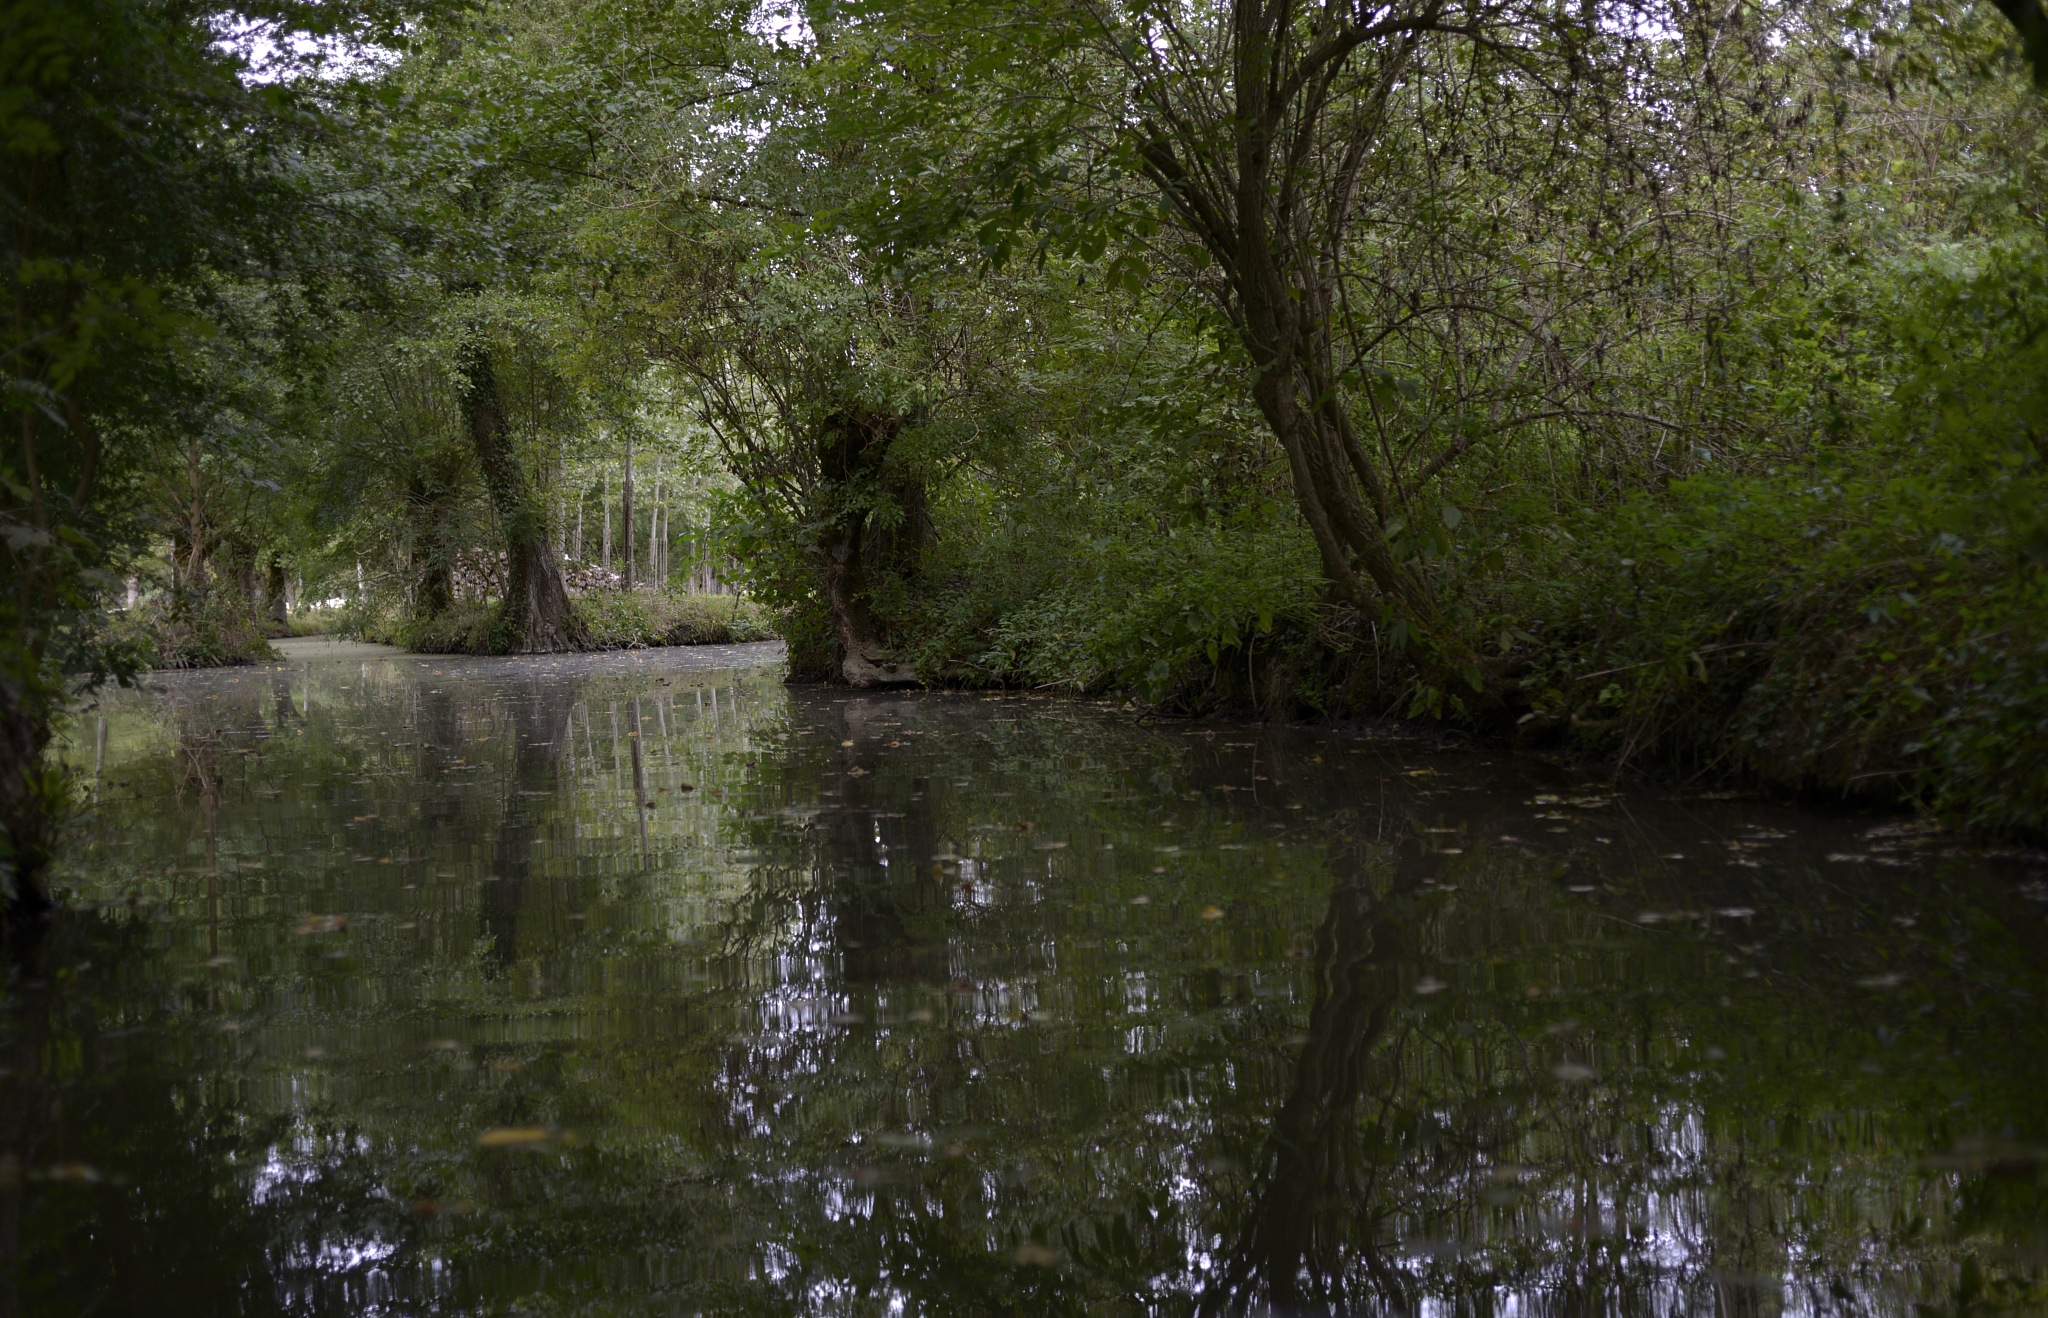 Please join me through the Marais Poitevin #1 by Lydie Burgunder